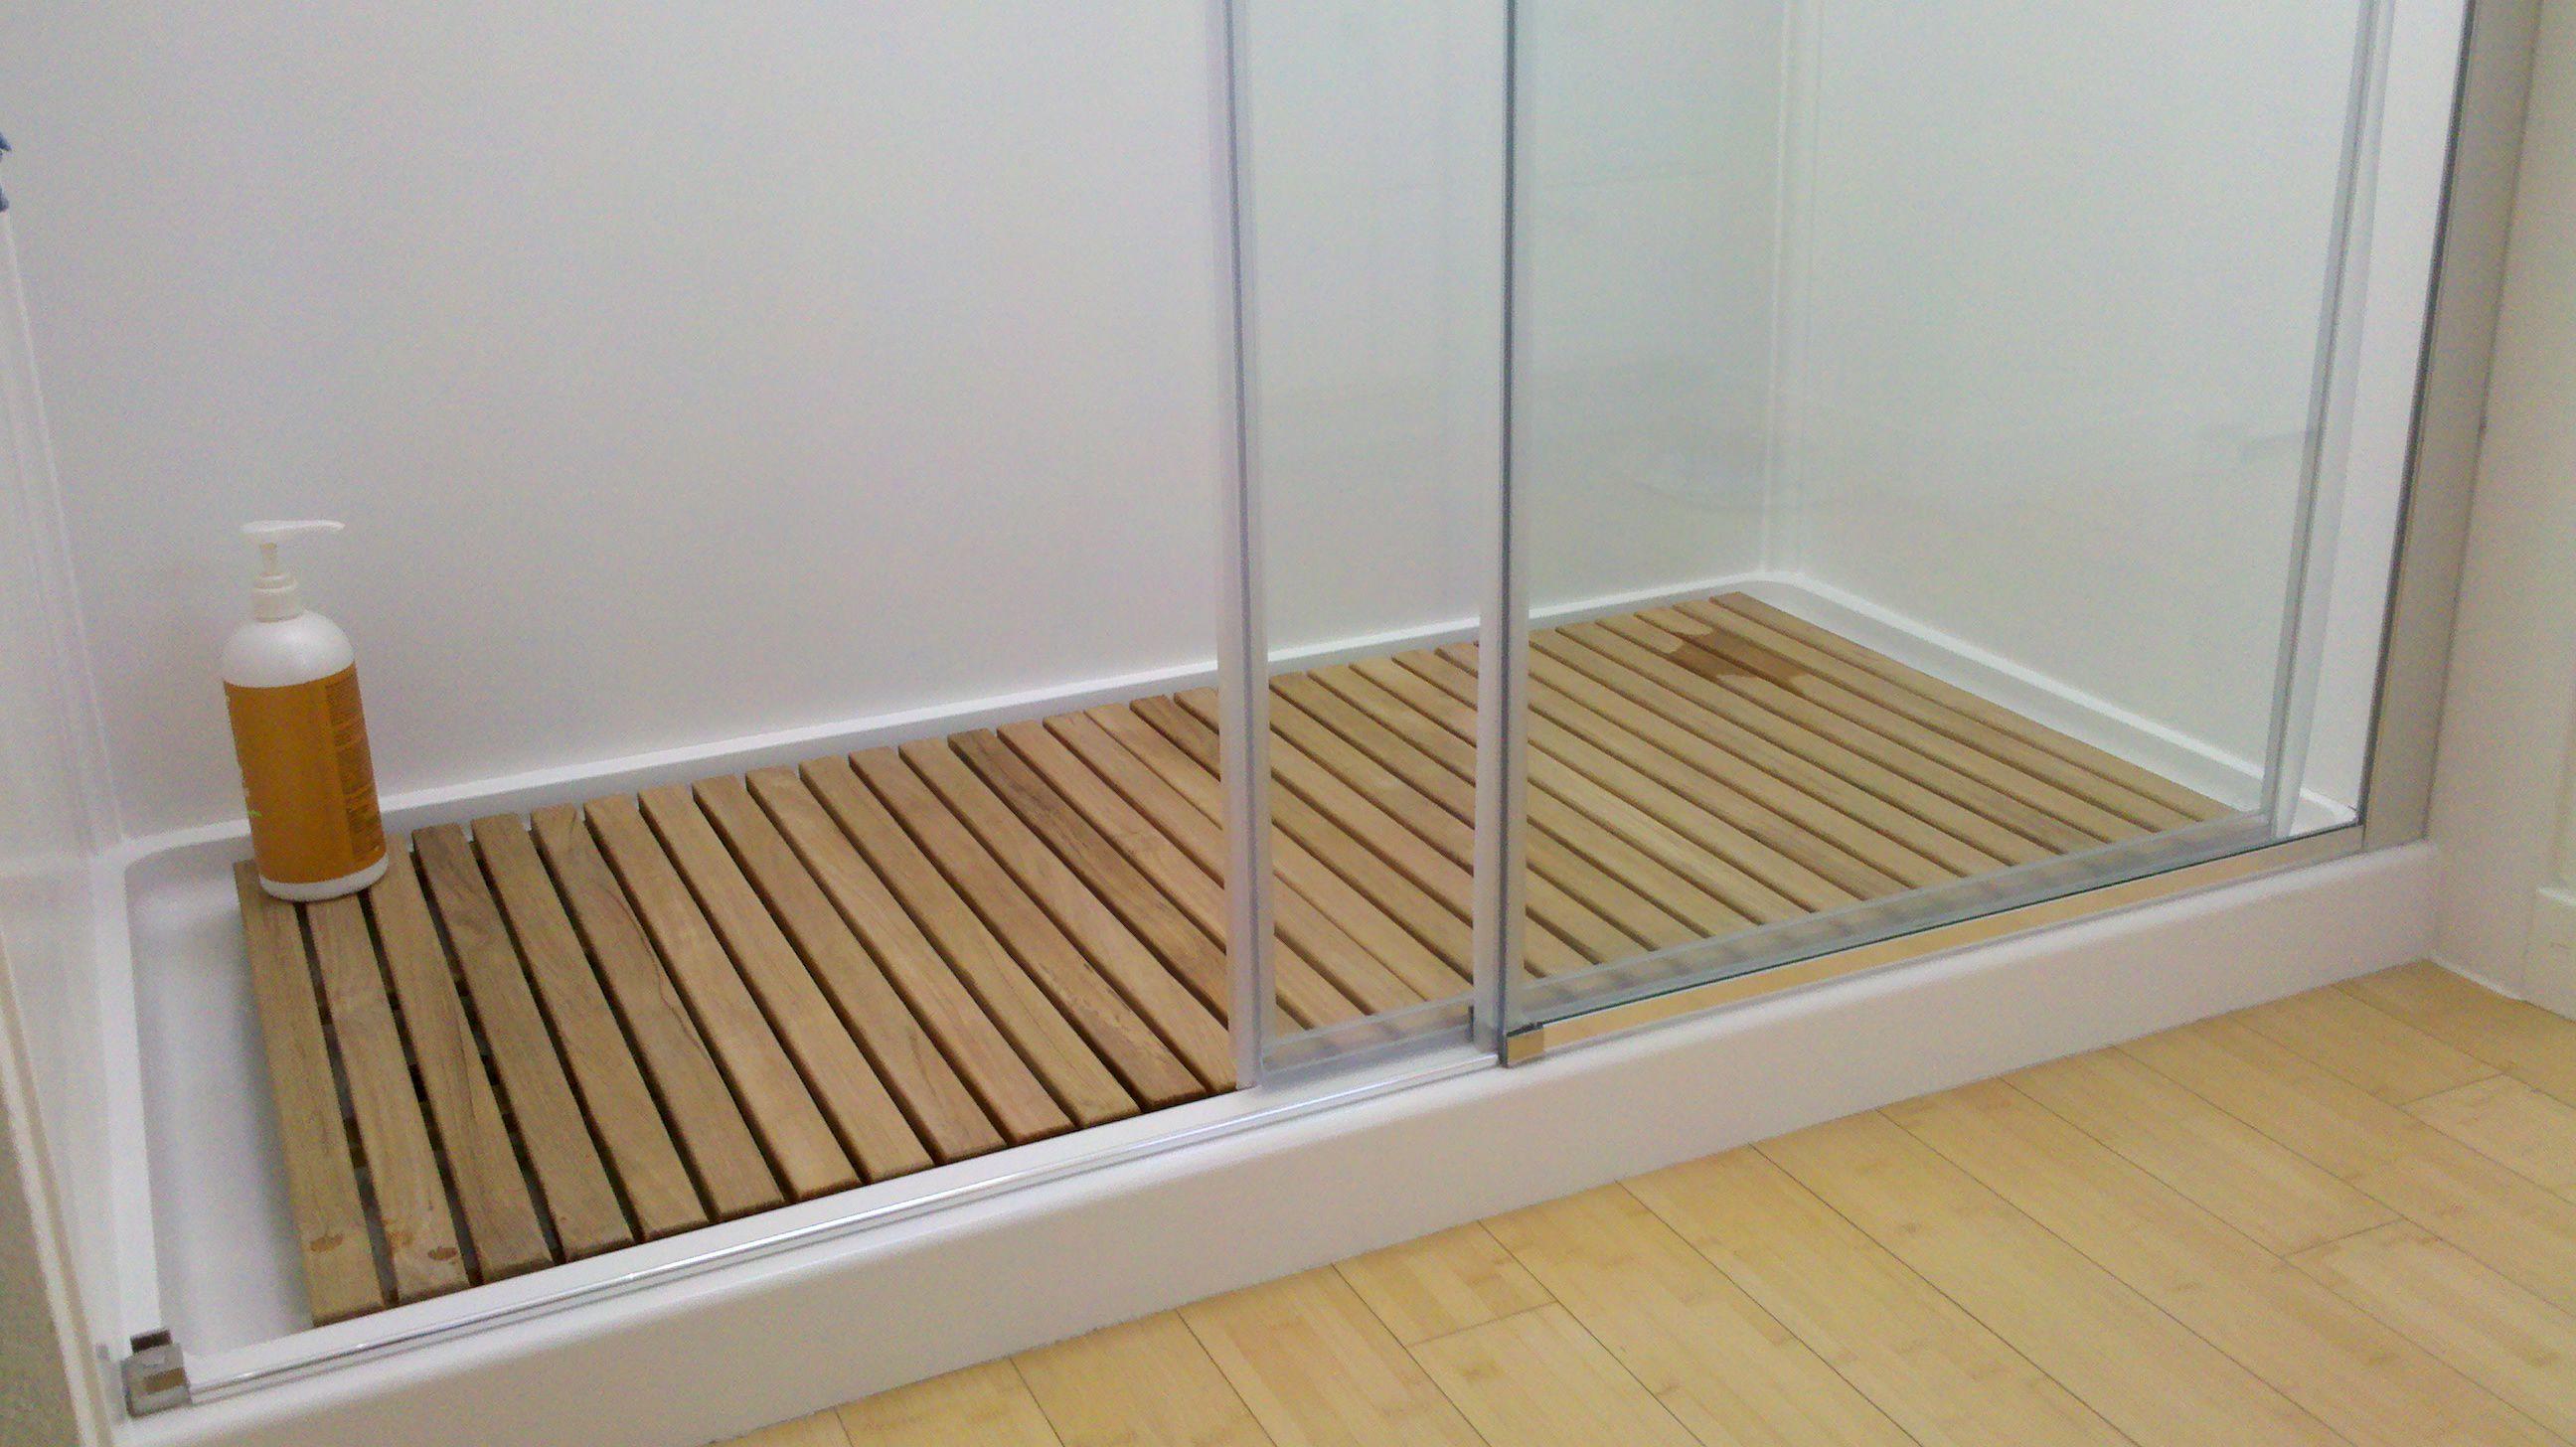 Diy Chair Mat For Hardwood Floor Desk Ikea Teak Bath In Shower Ca Customer Photo